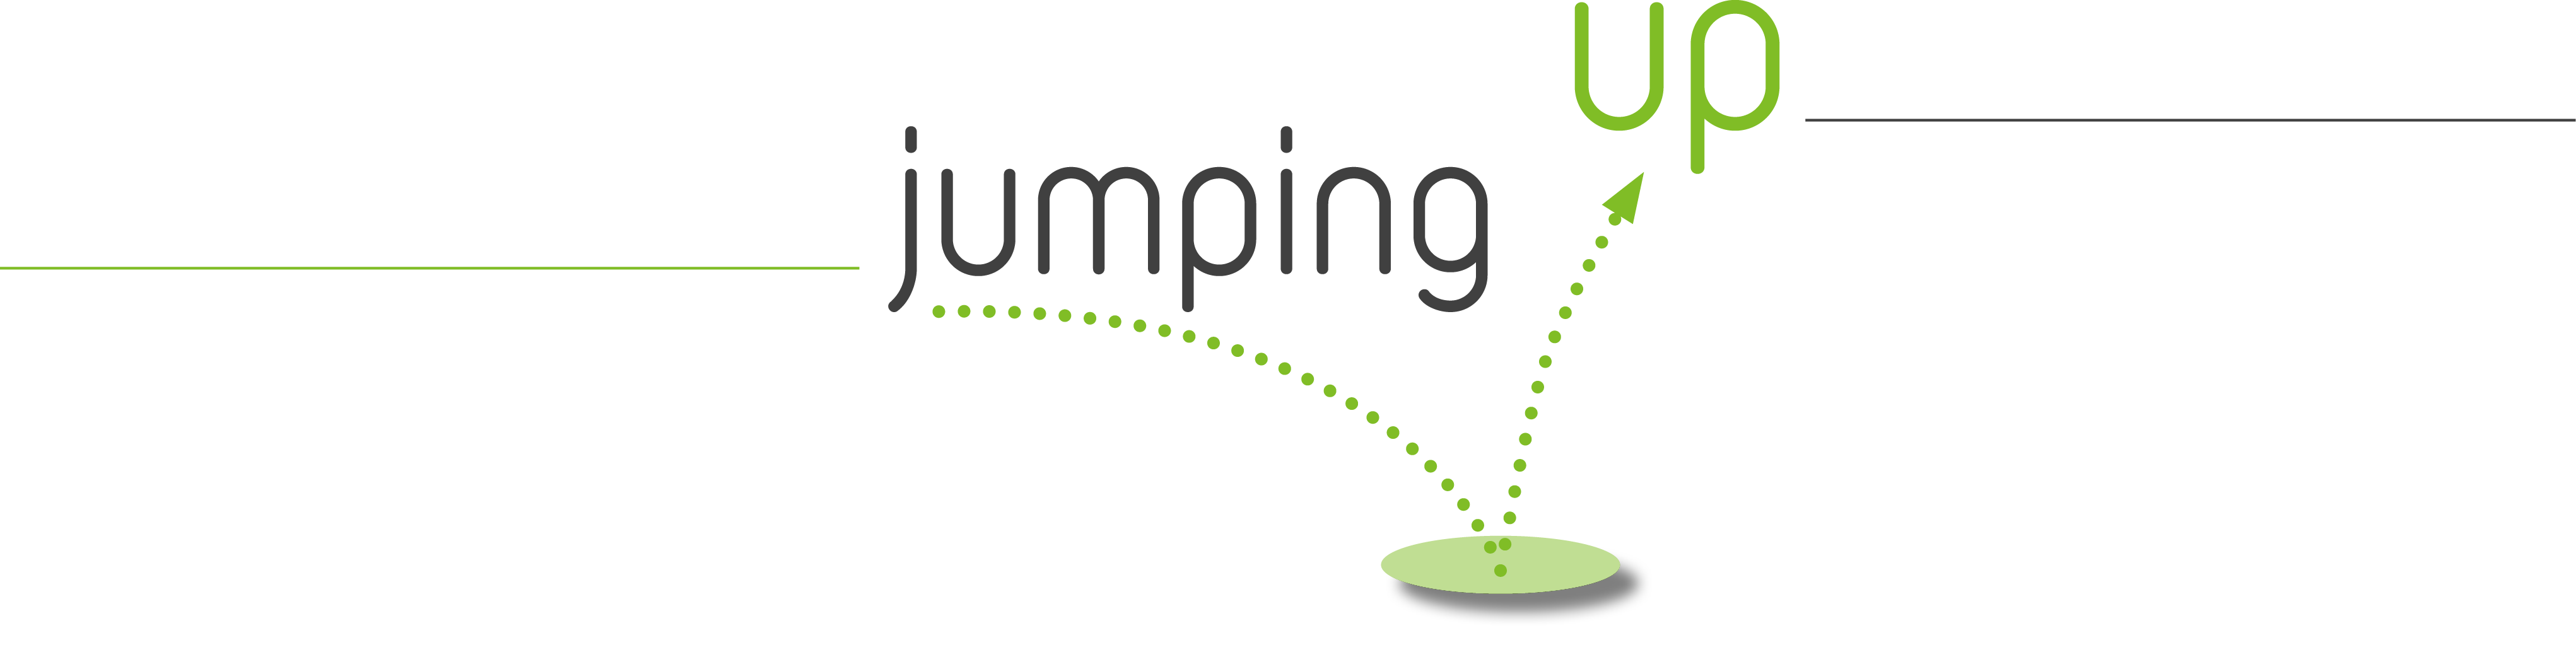 www.jumpingup.ch